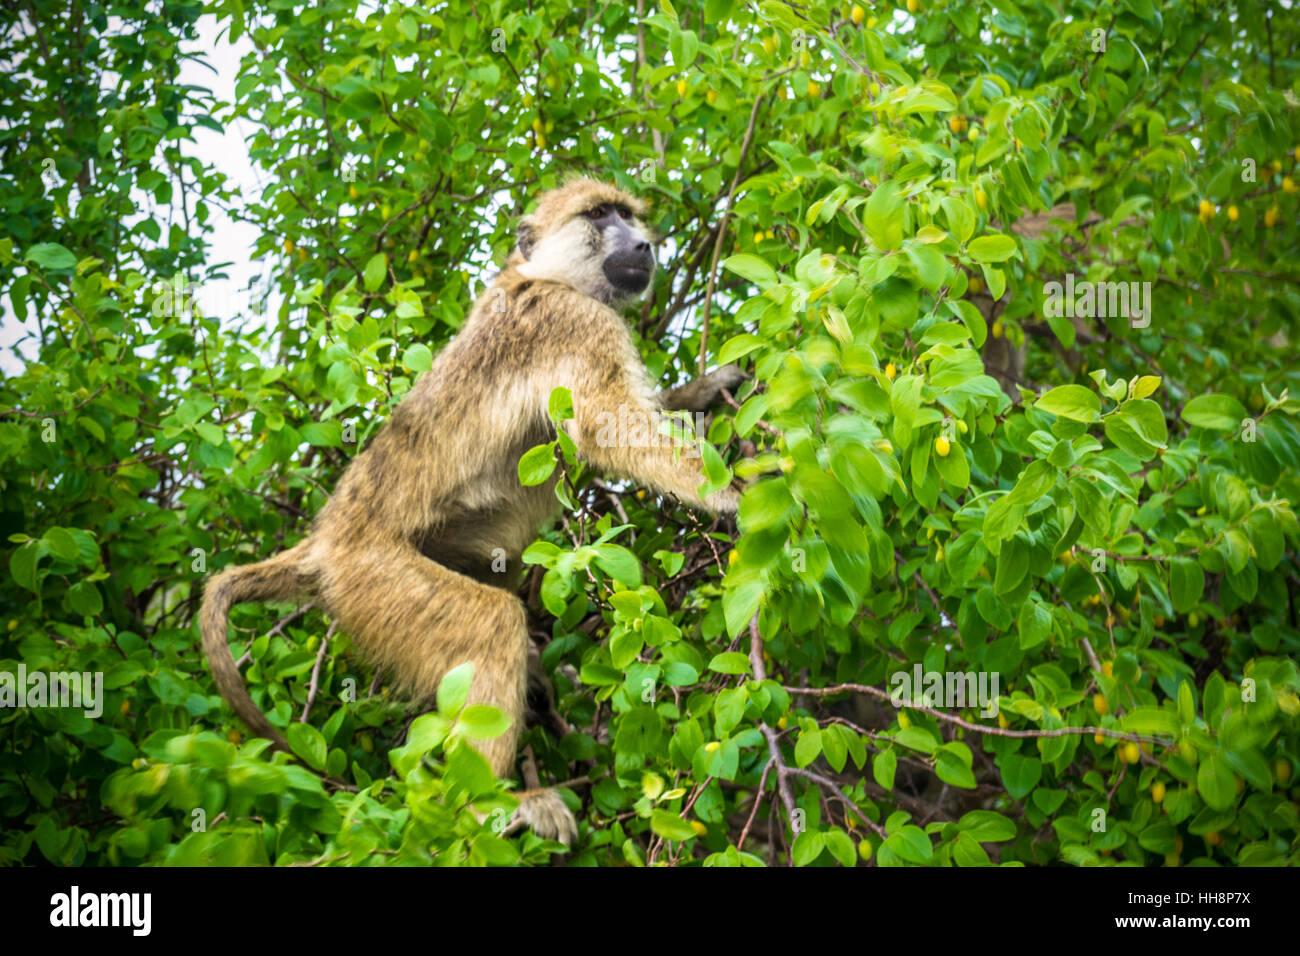 Wild monkey on the tree, Africa, Tanzania, safari - Stock Image